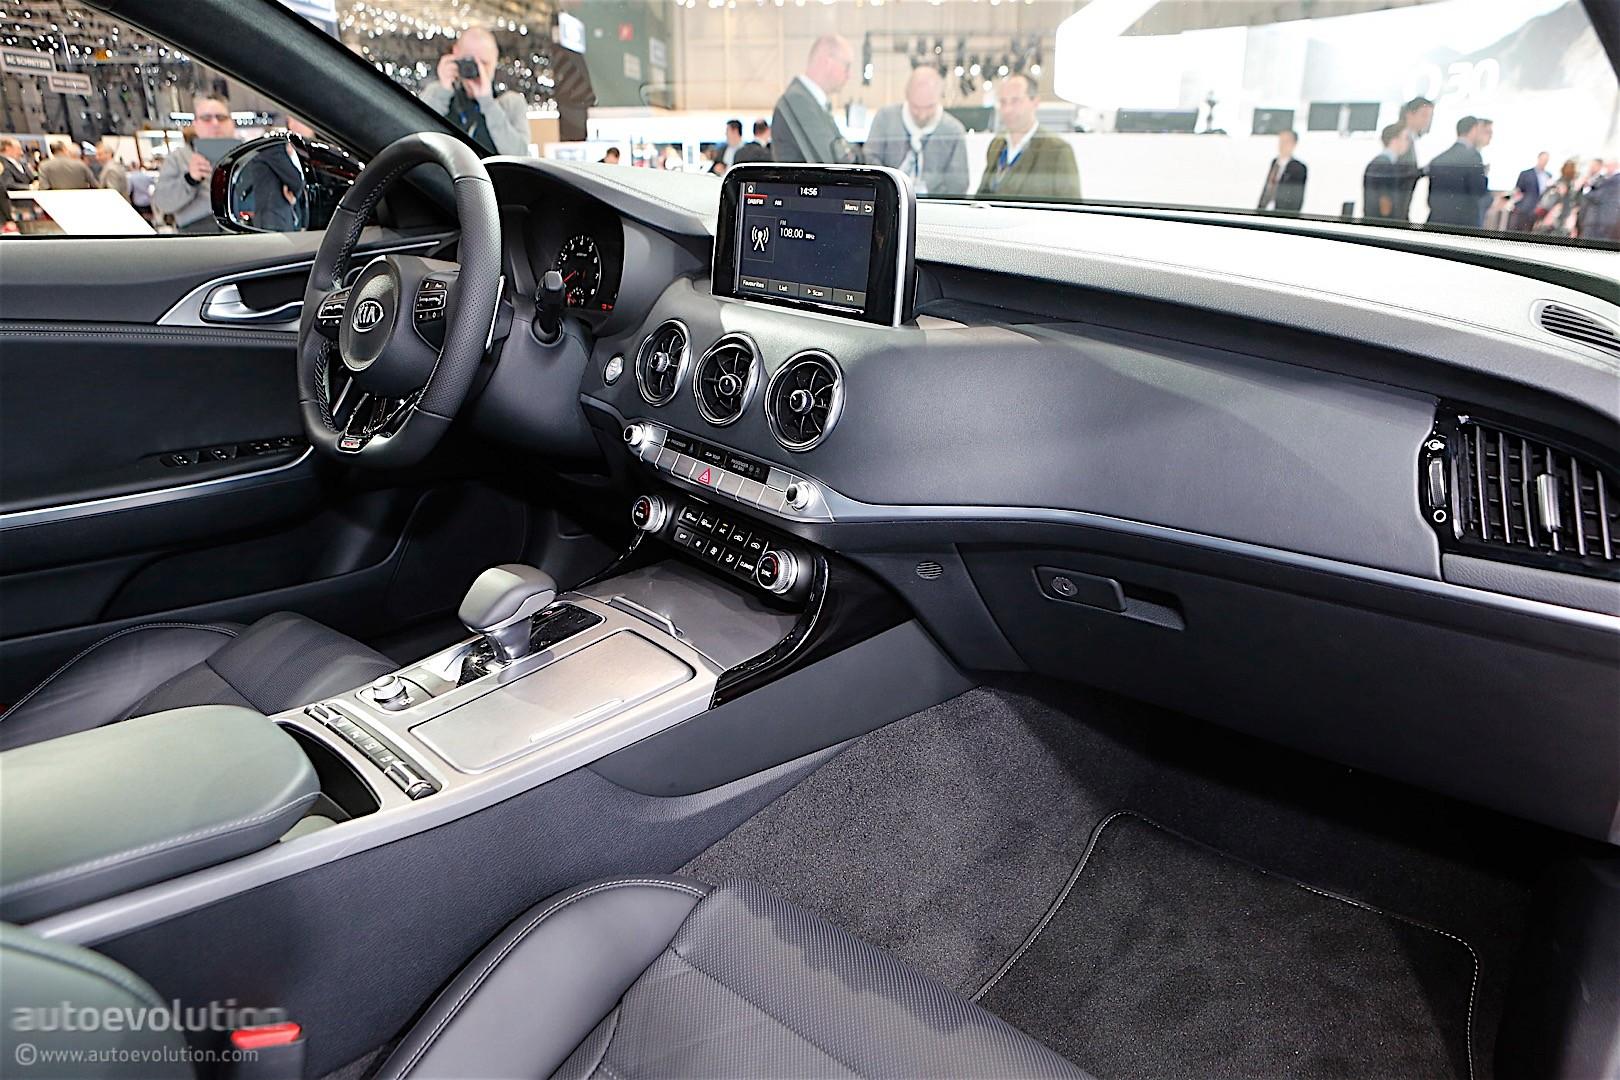 2018 kia stinger gt hits 100 km h 62 mph in 4 9 seconds autoevolution. Black Bedroom Furniture Sets. Home Design Ideas